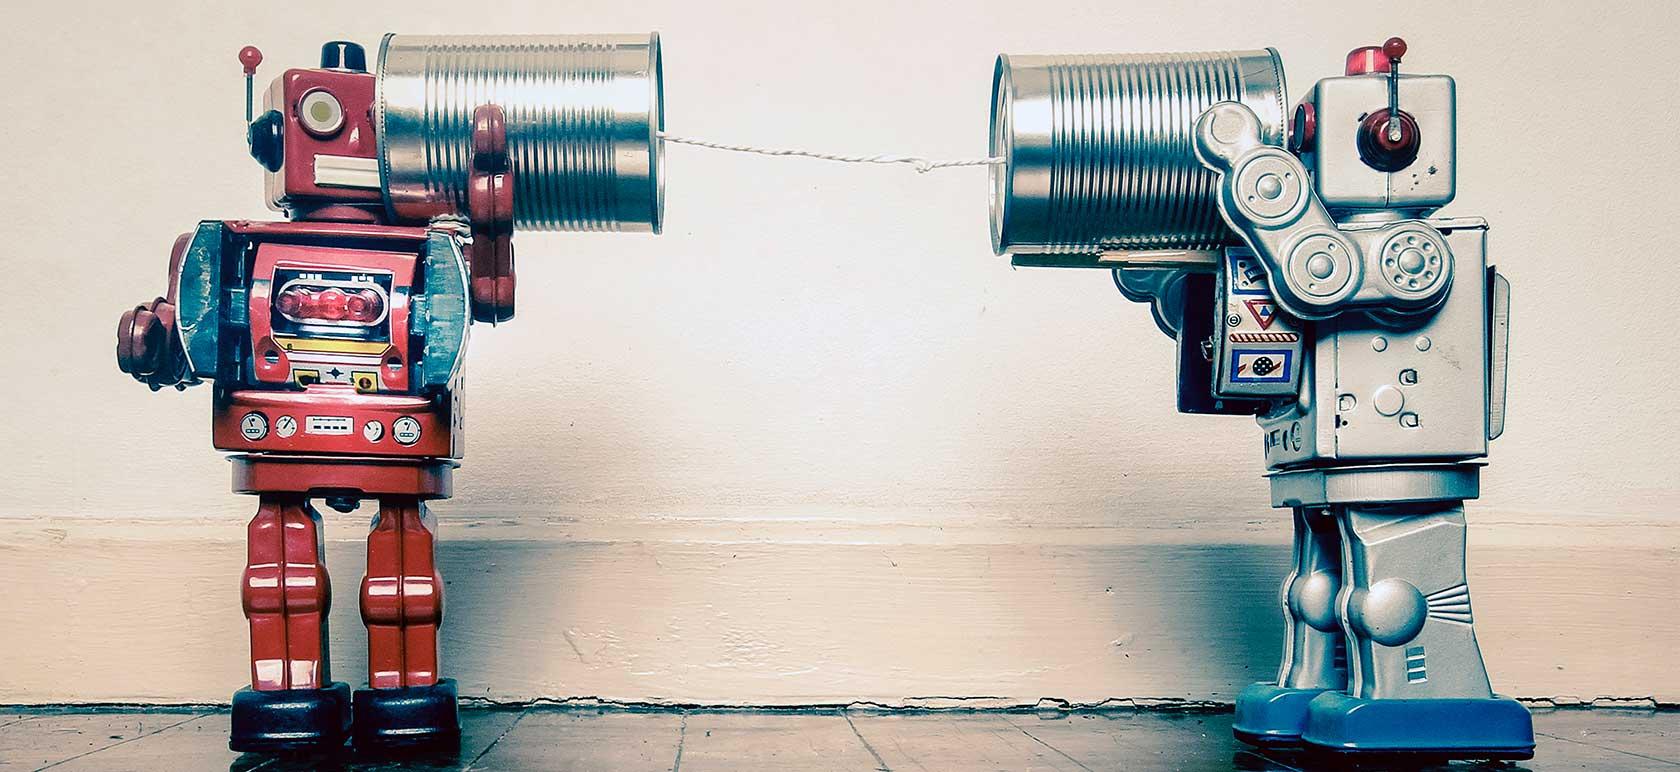 Communication for the NonCommunicator